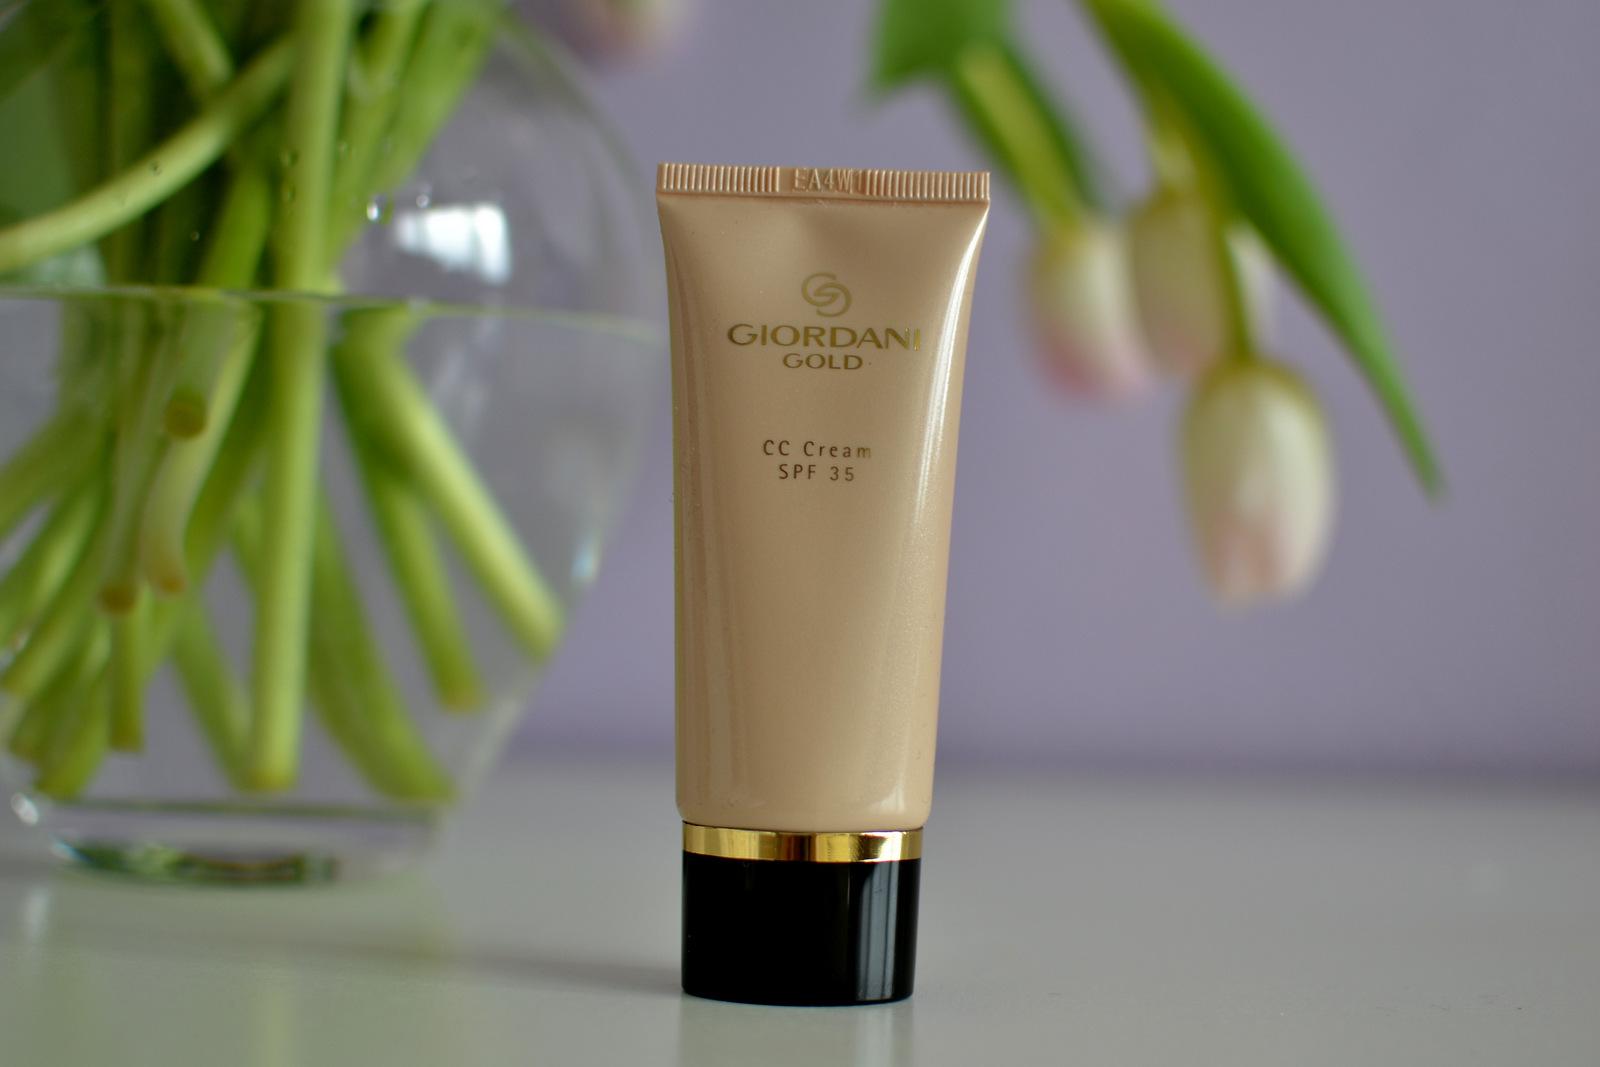 Mademoiselle Iva By Ivana Klepov Beauty Tip Oriflame 4 2016 Giordani Gold Cc Cream Spf 35 Krm So